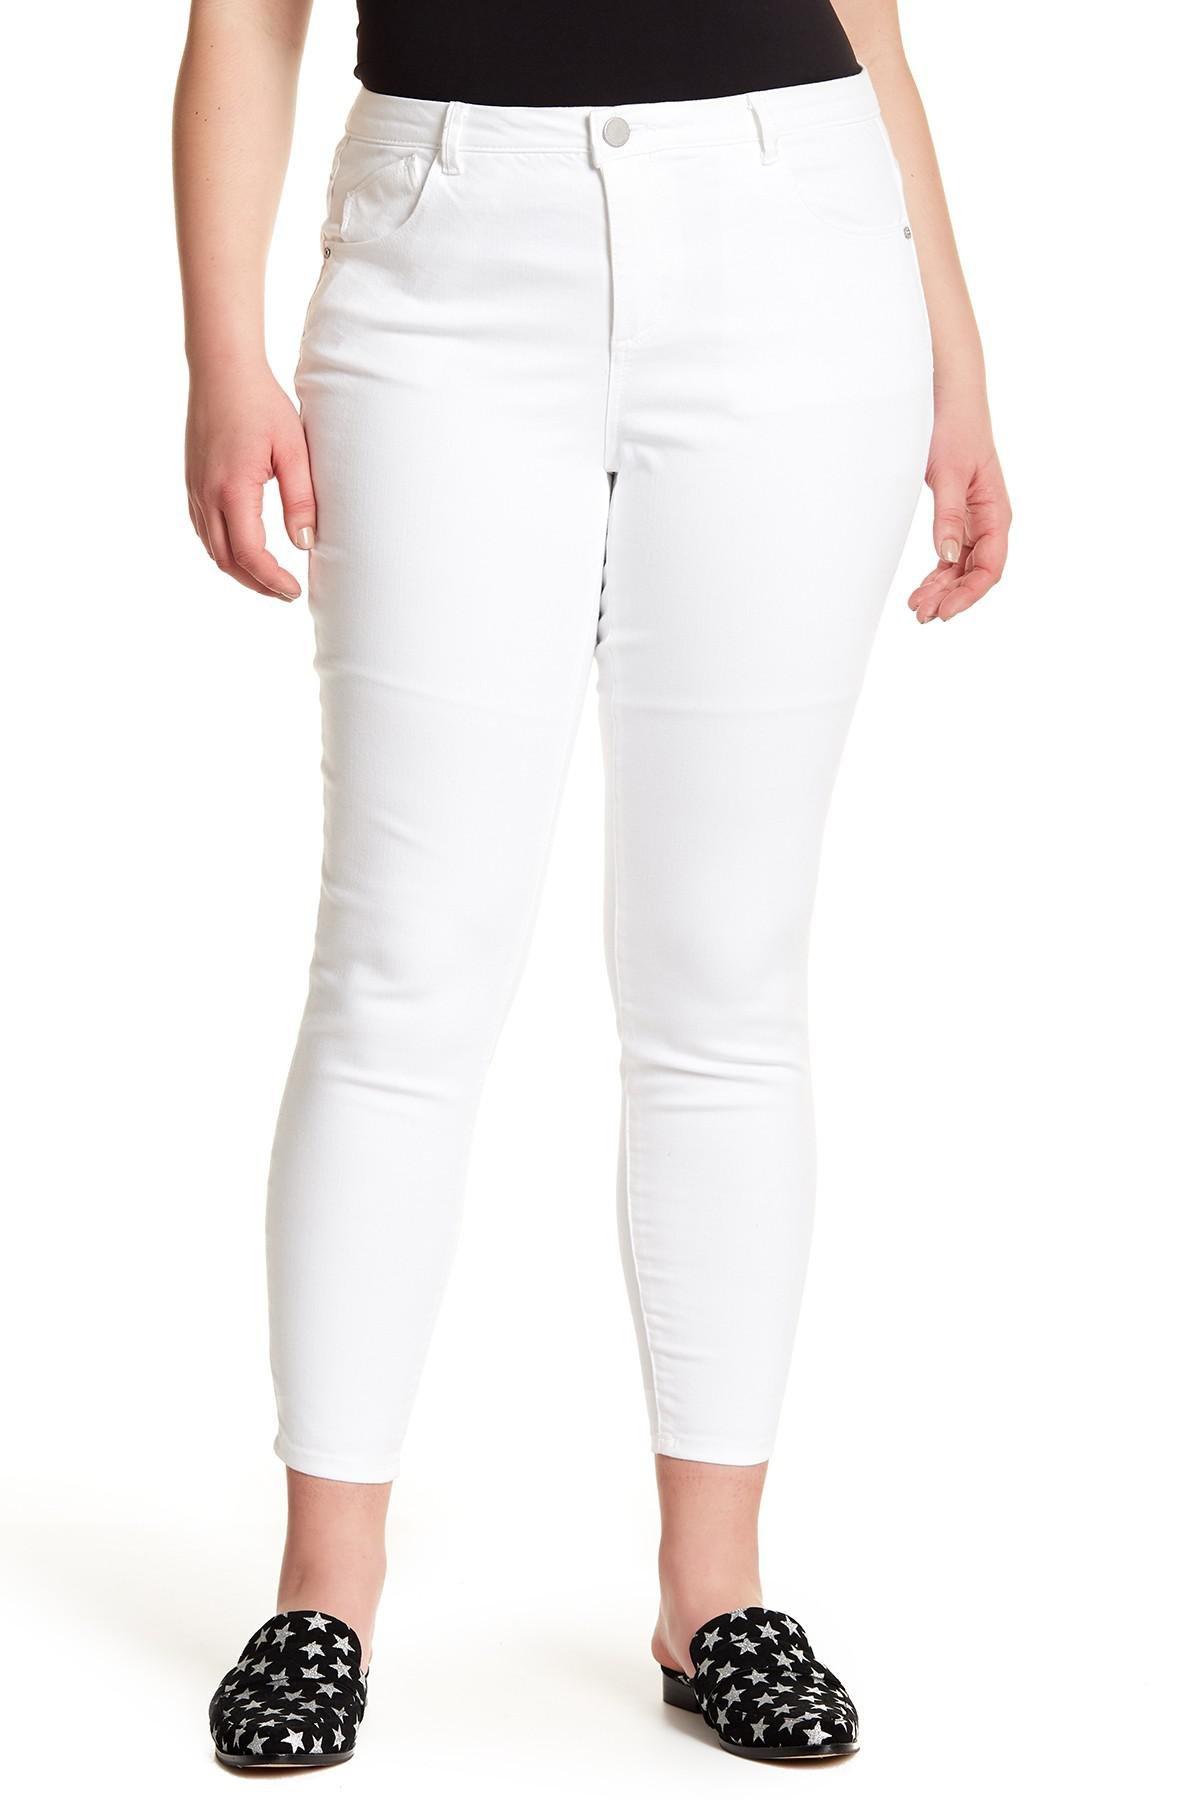 247f86bdb4fd2 Democracy. Women s White High Rise Tummy Control Ankle Jeans (plus Size)